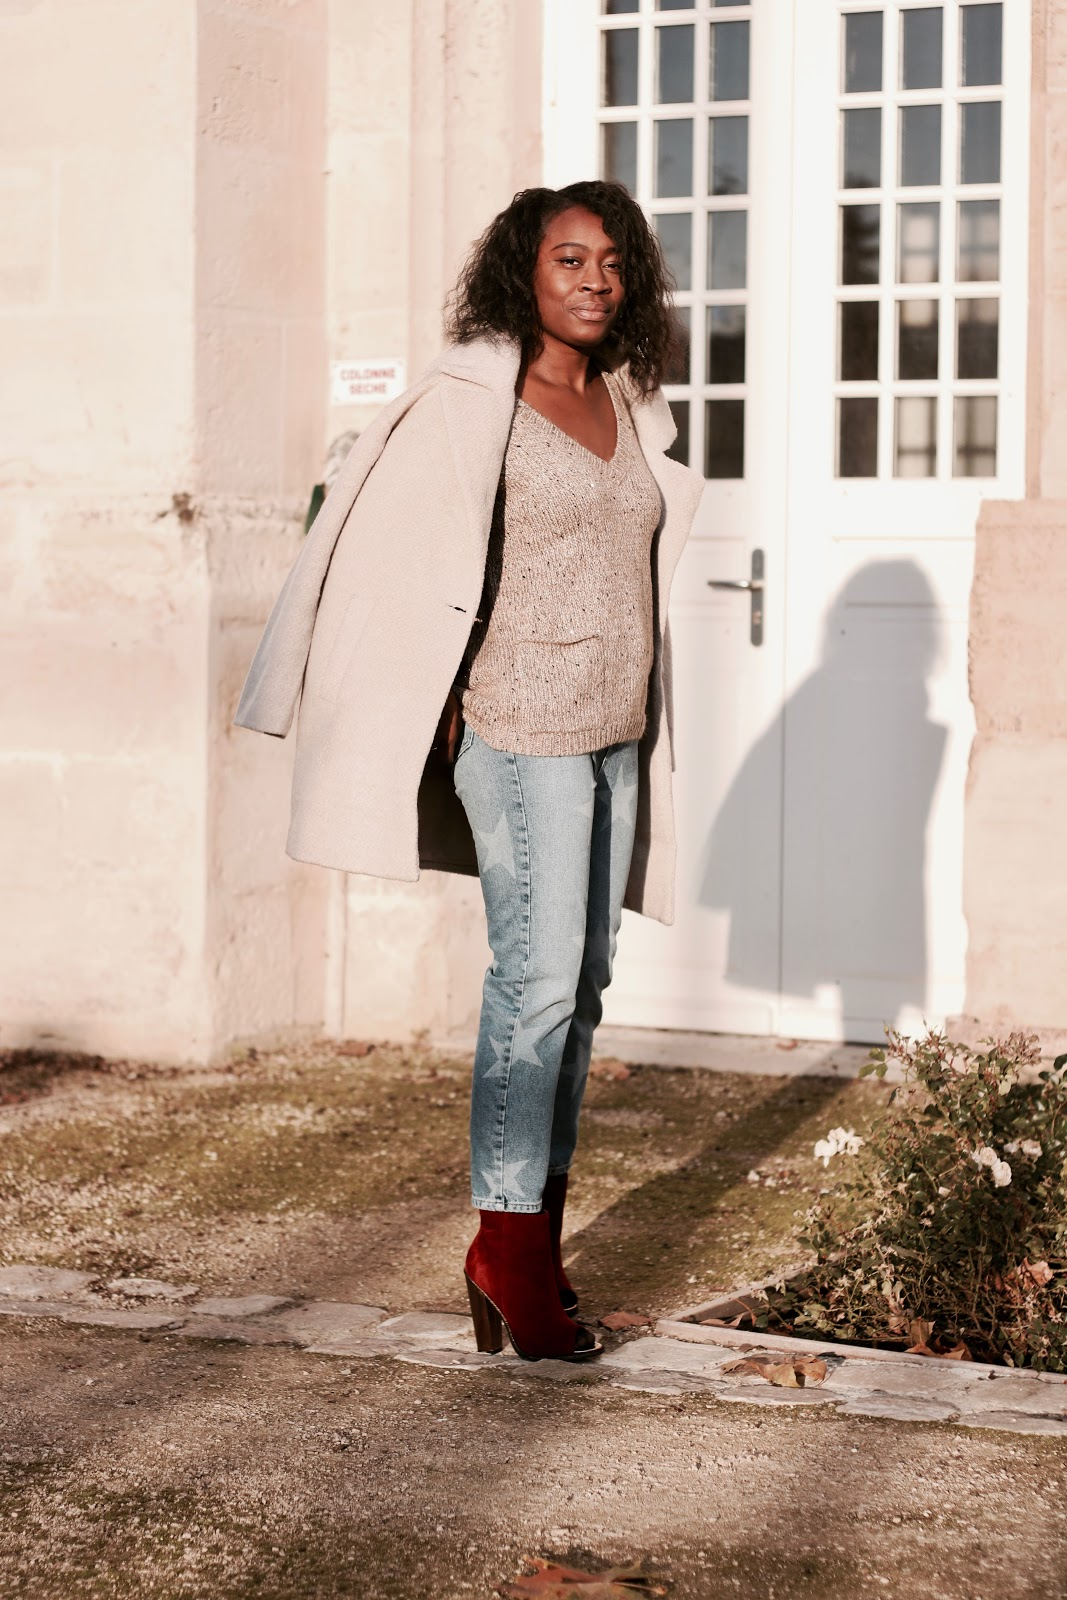 blog-mode-tendance-chic-jeans-etoiles